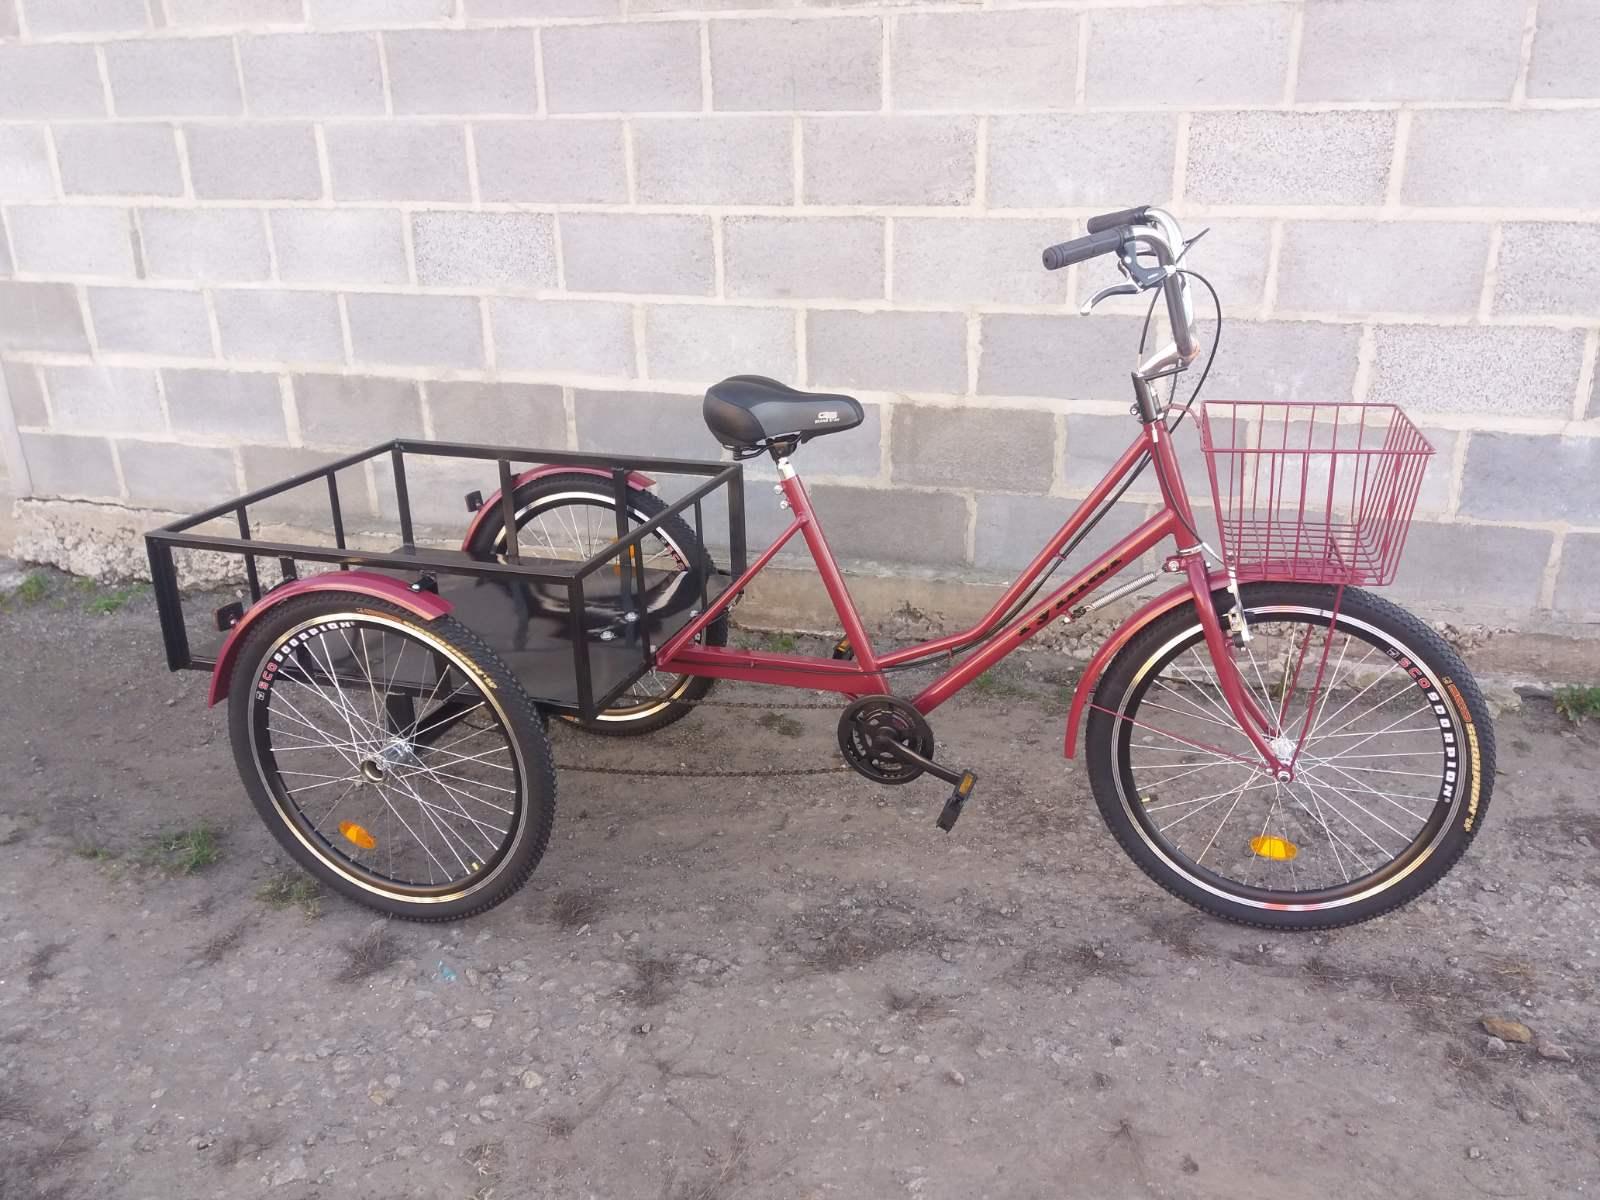 velosiped-gruzovoy